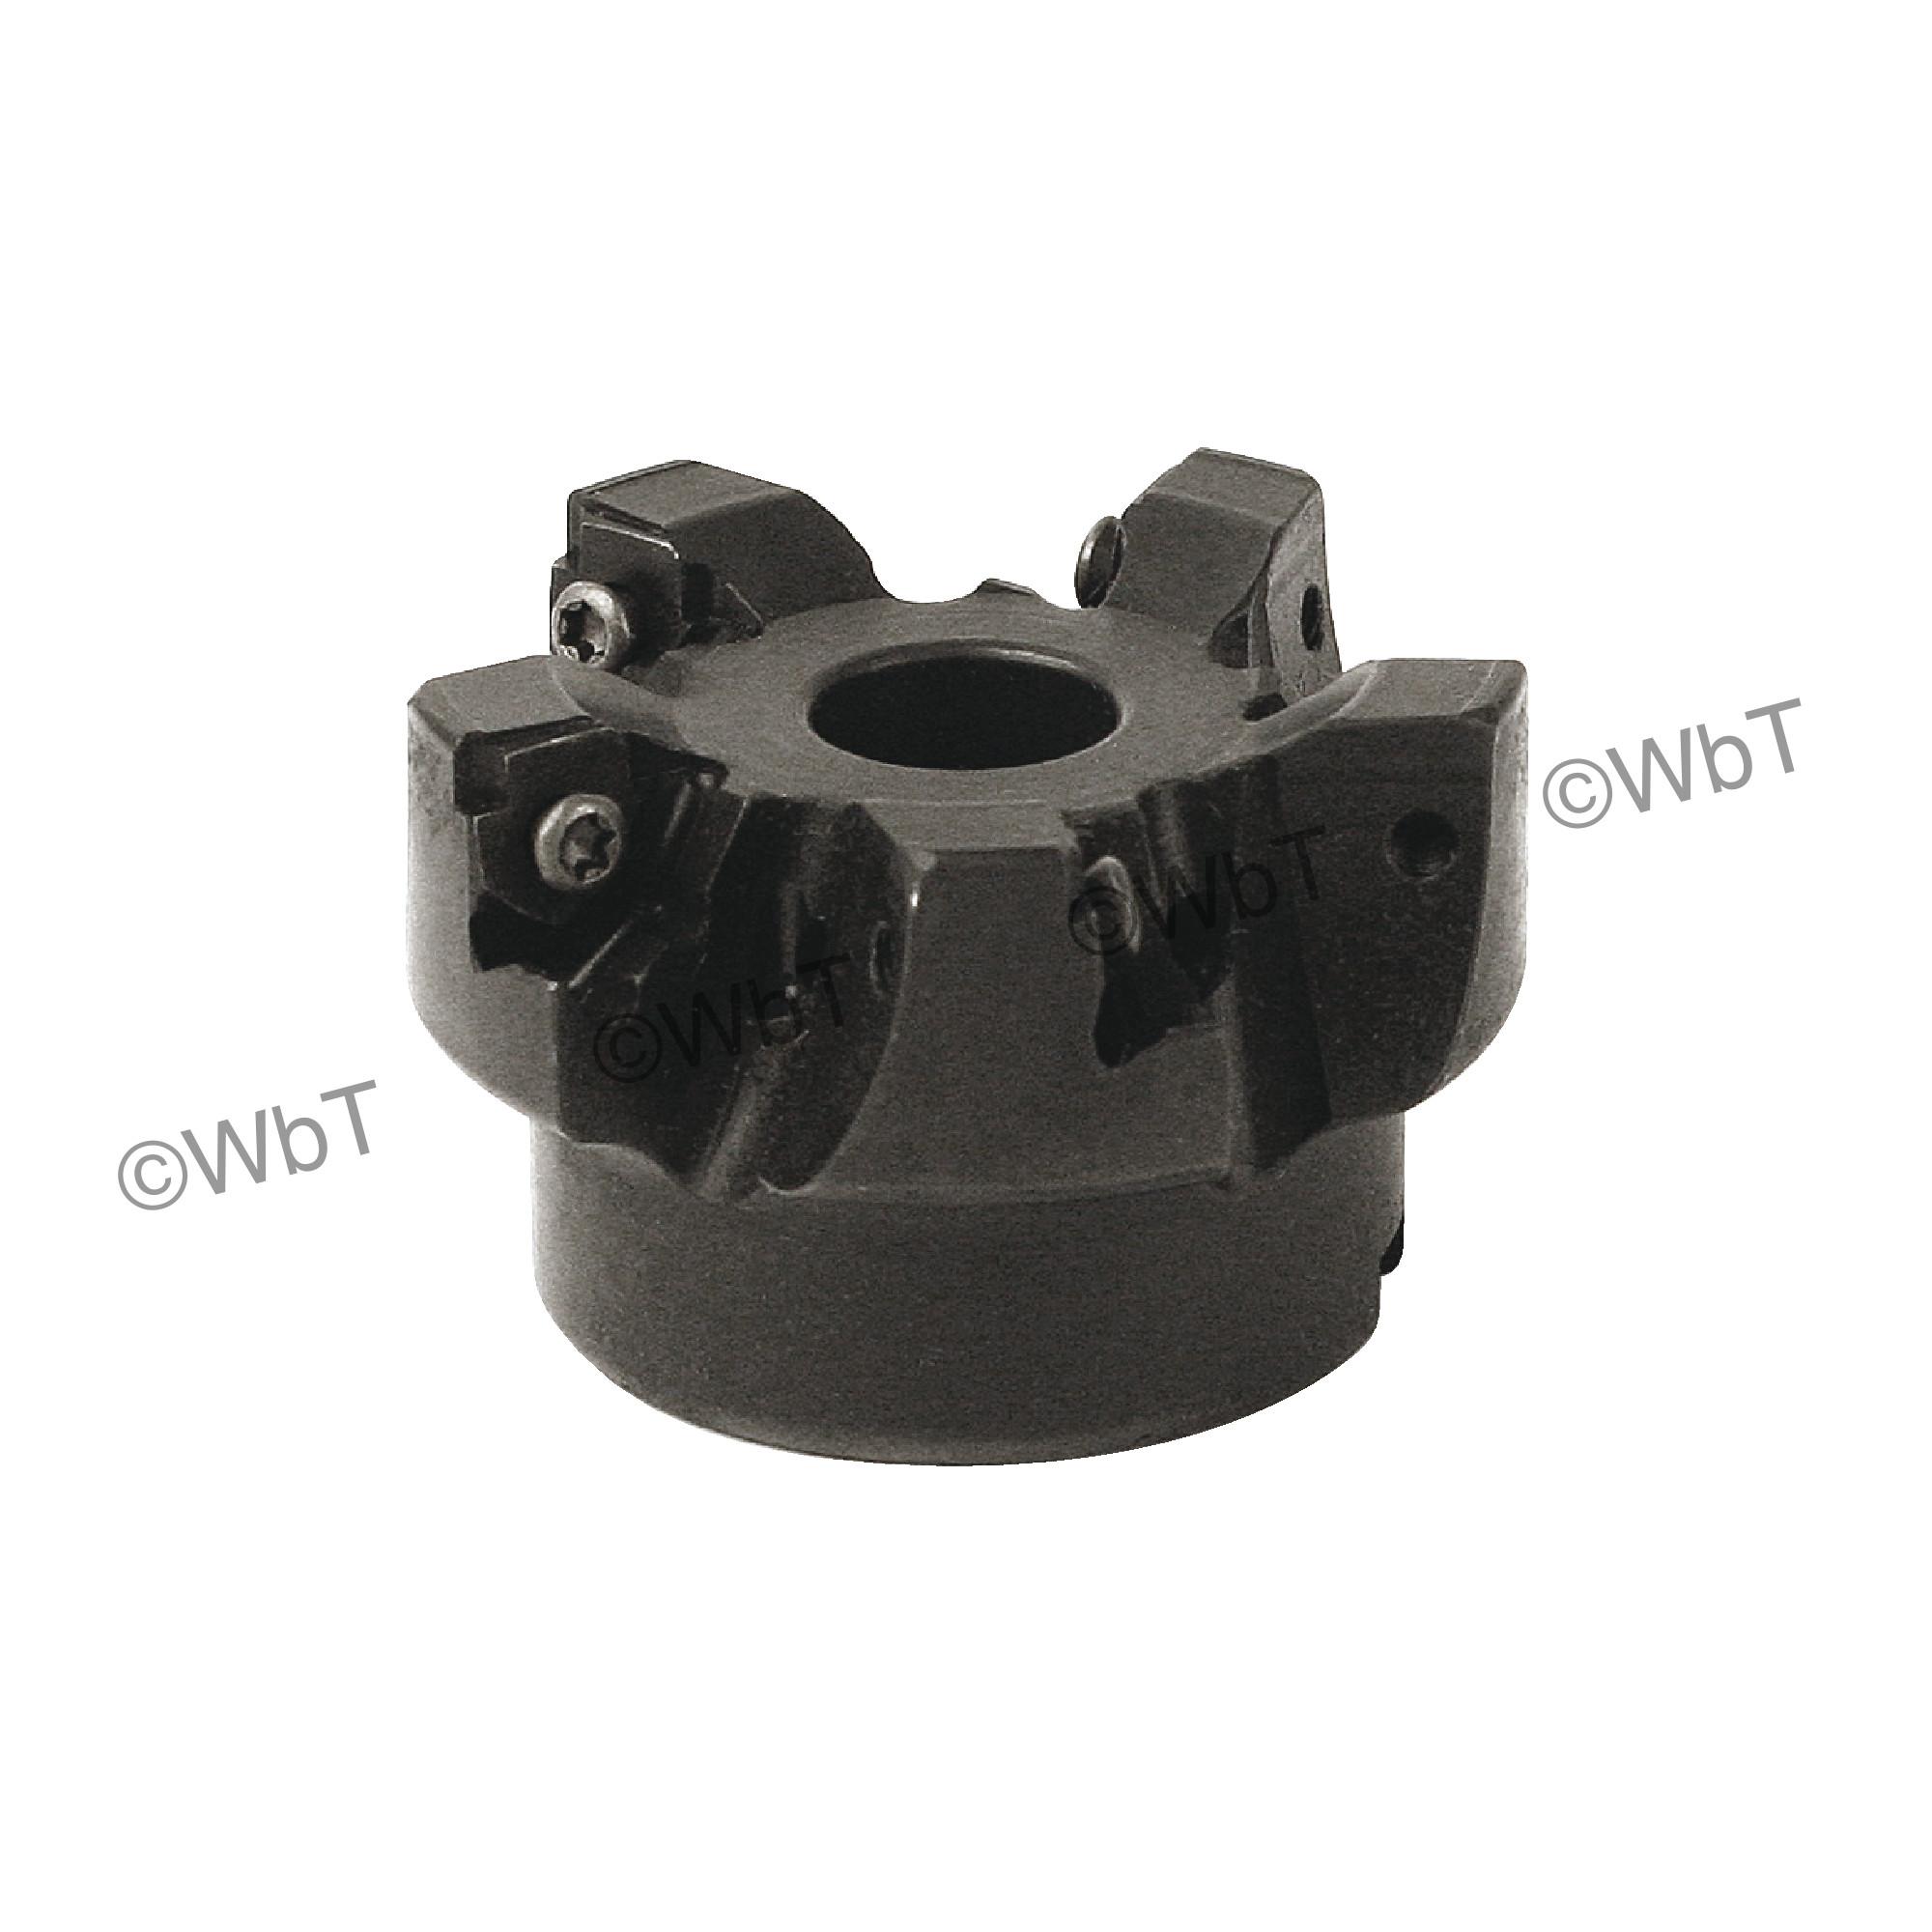 "AKUMA - XNPC.44.250R-5 / 2.500"" Face Mill for XNEX44_R Inserts / Right Hand"